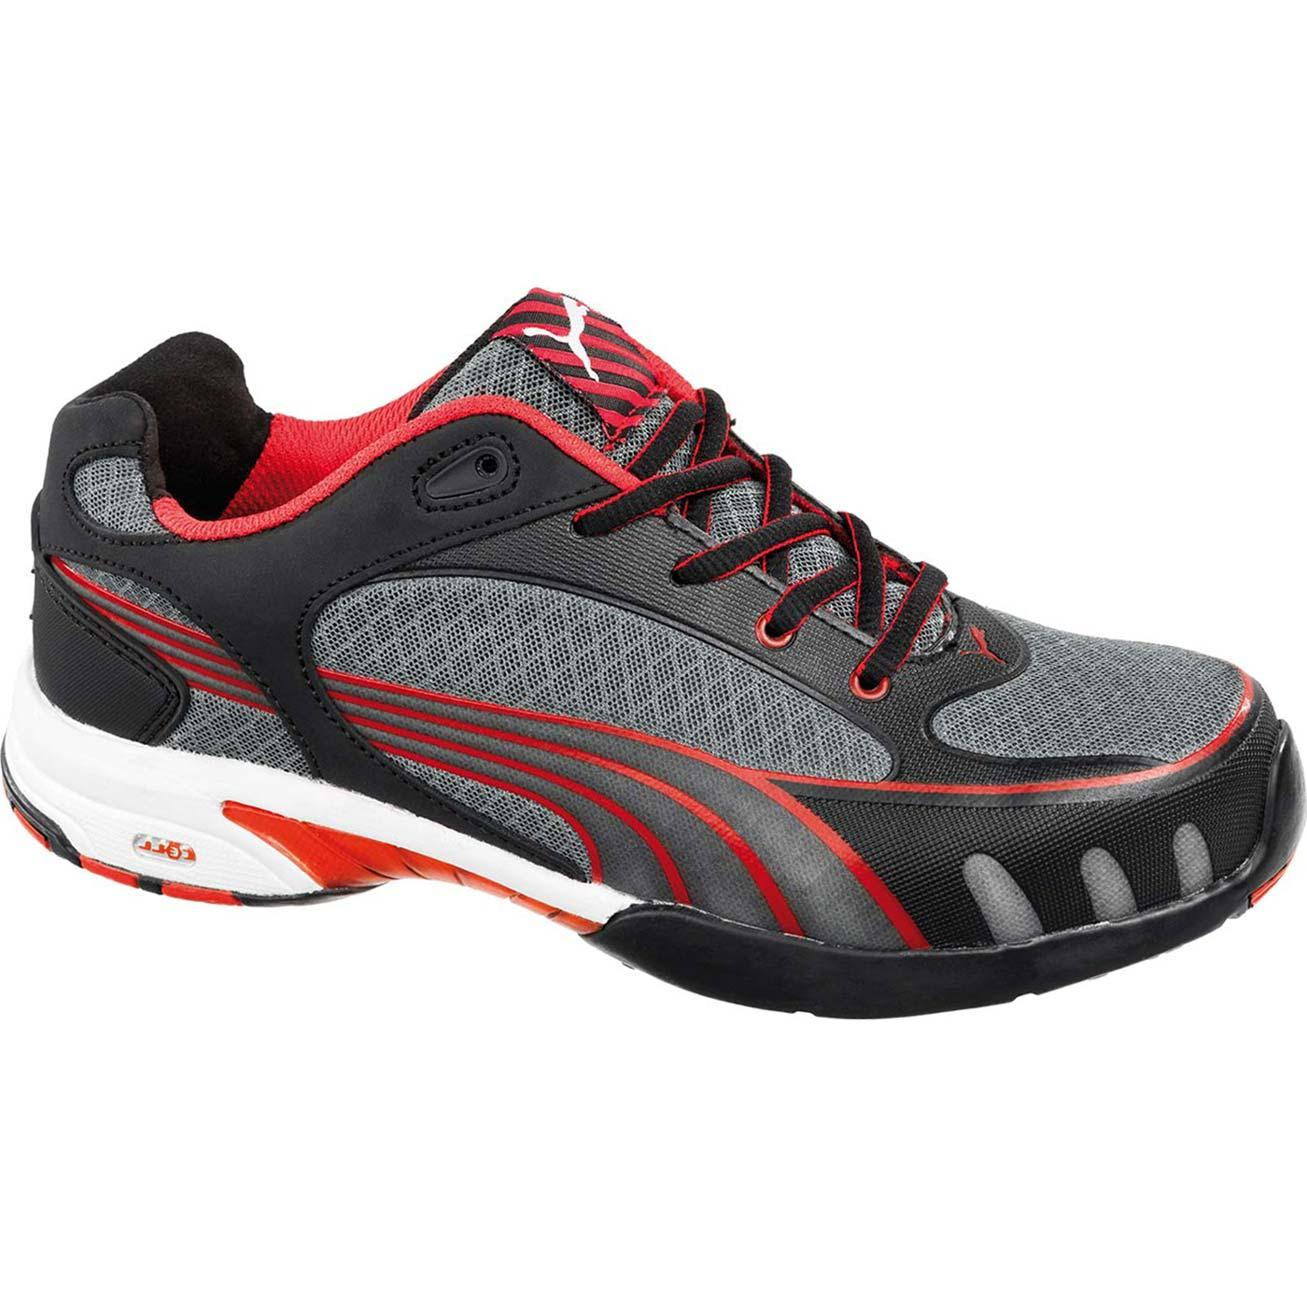 b7cc41d3ab9129 Puma Fuse Motion Women s Steel Toe Static-Dissipative Work Athletic Shoe